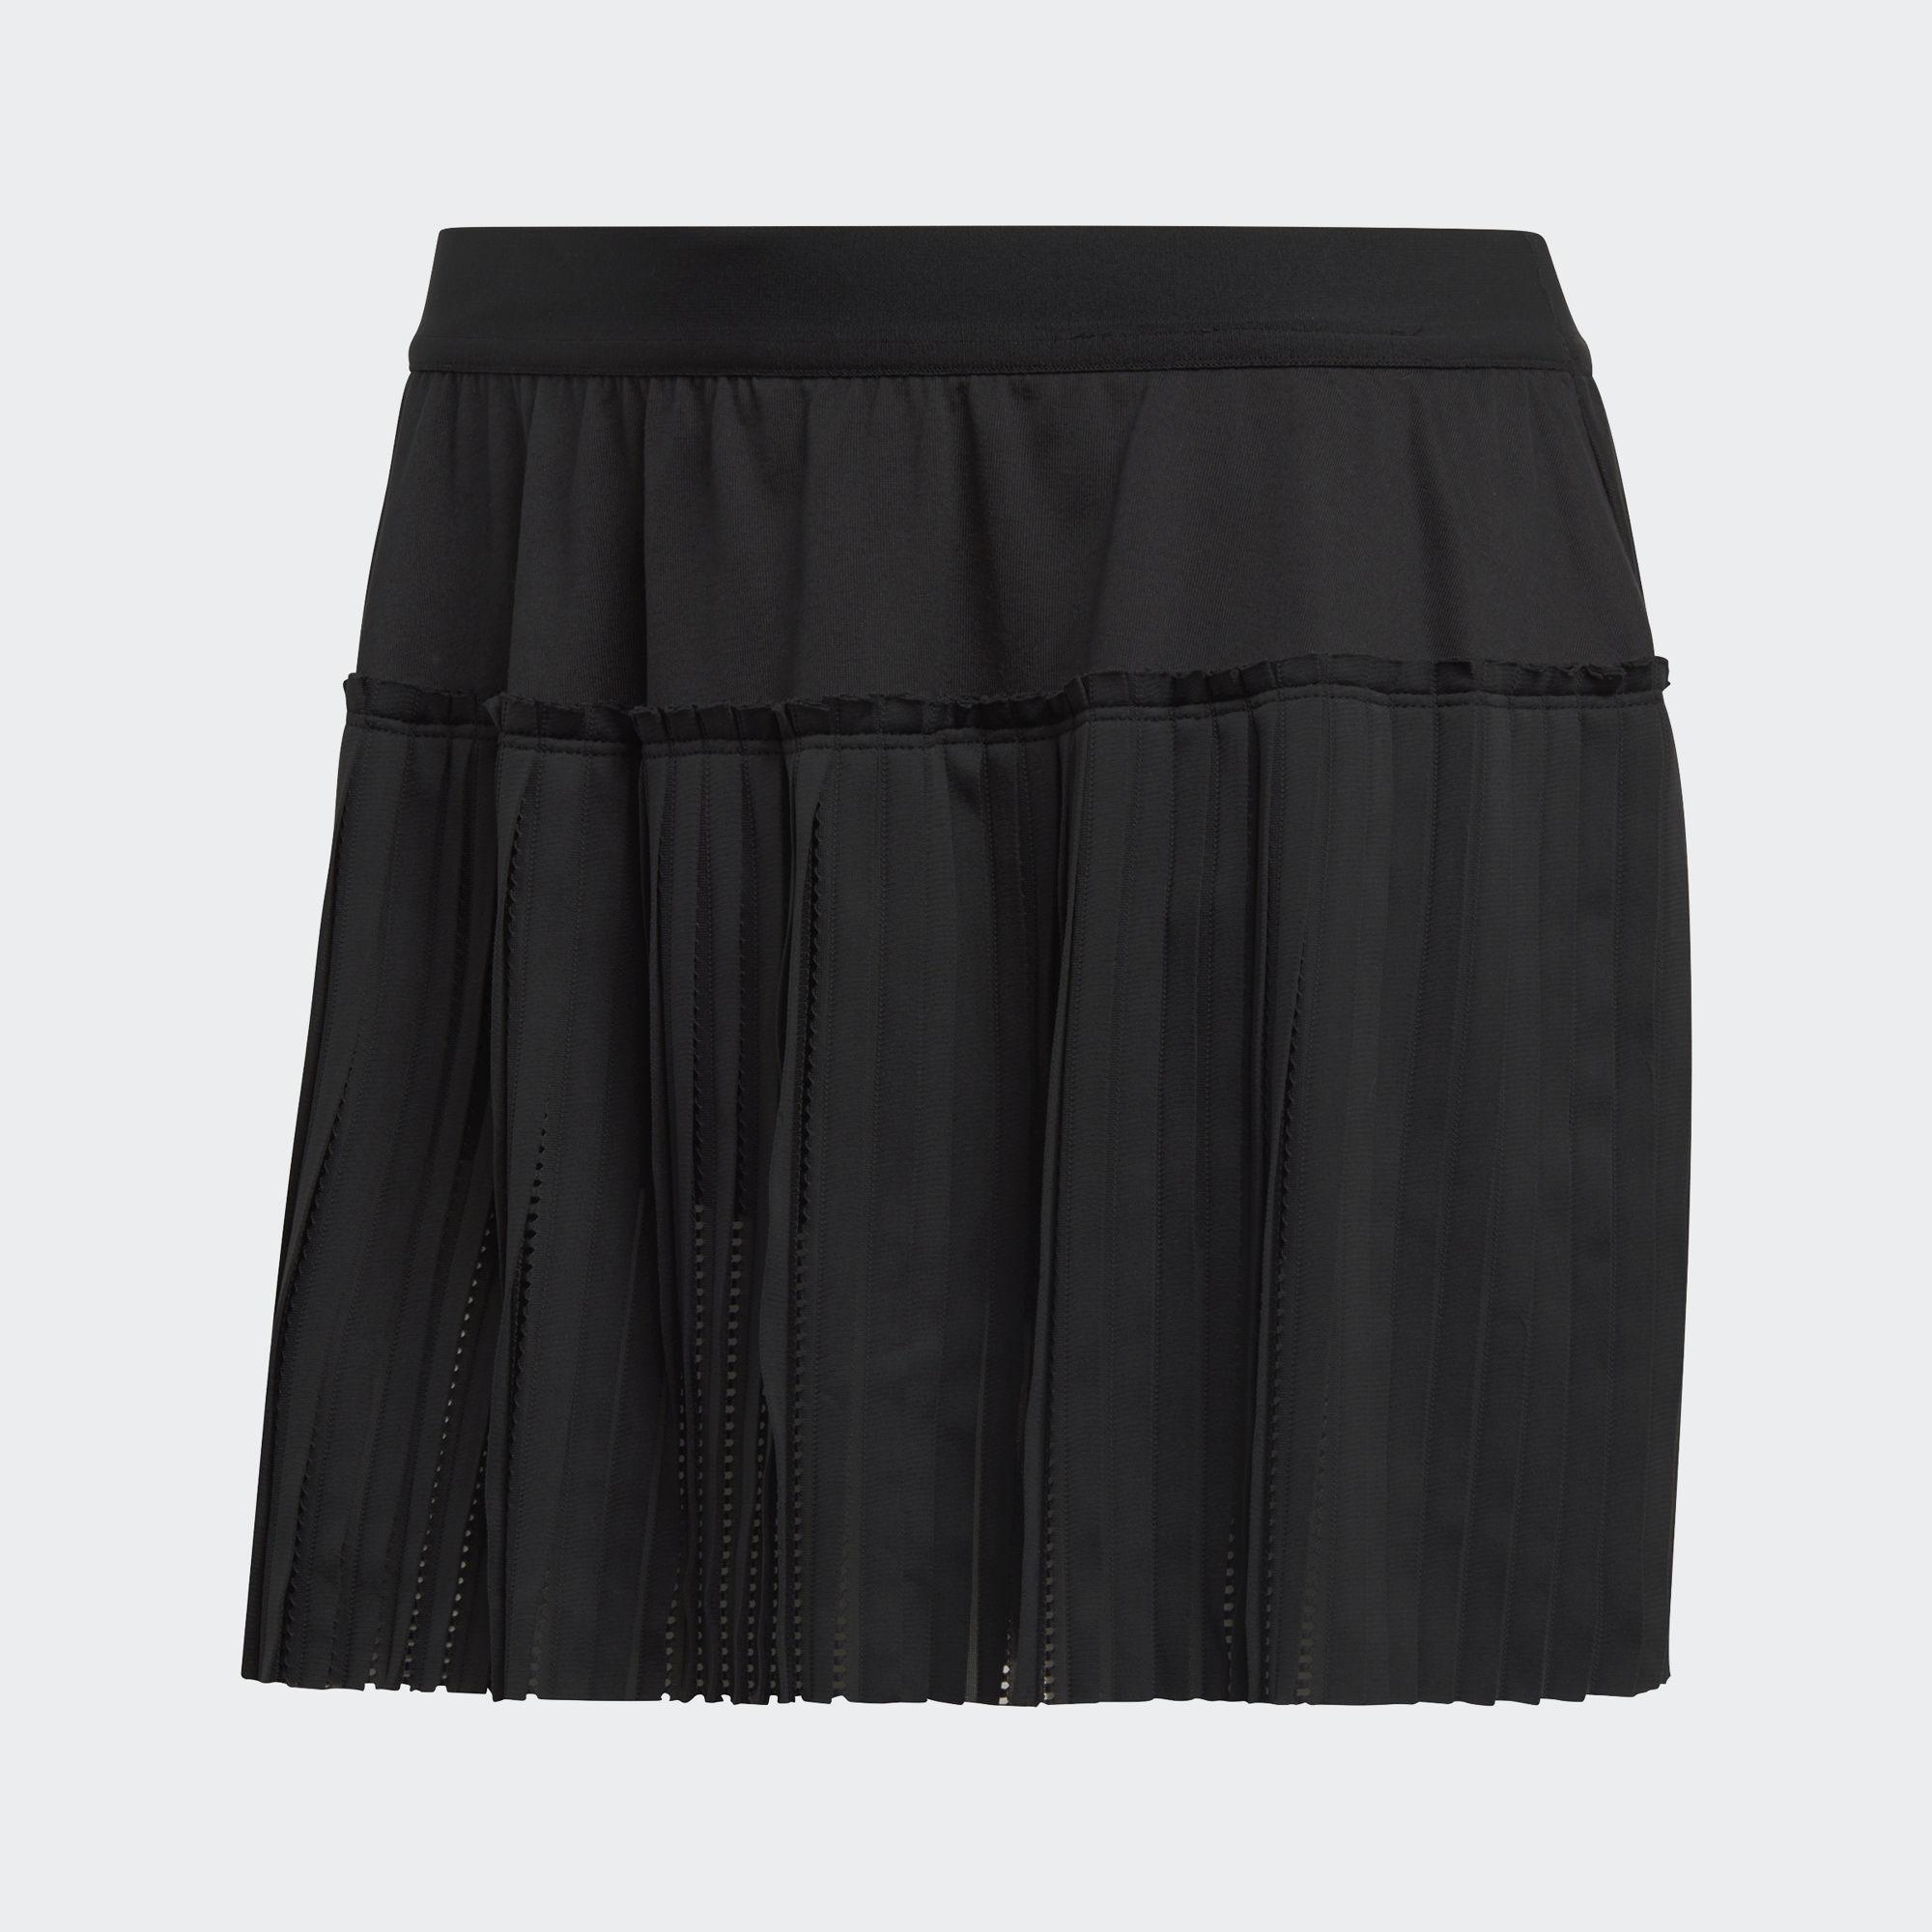 0b4c75c01e5f3 Adidas Womens MatchCode 13 Inch Skort - Black - Tennisnuts.com